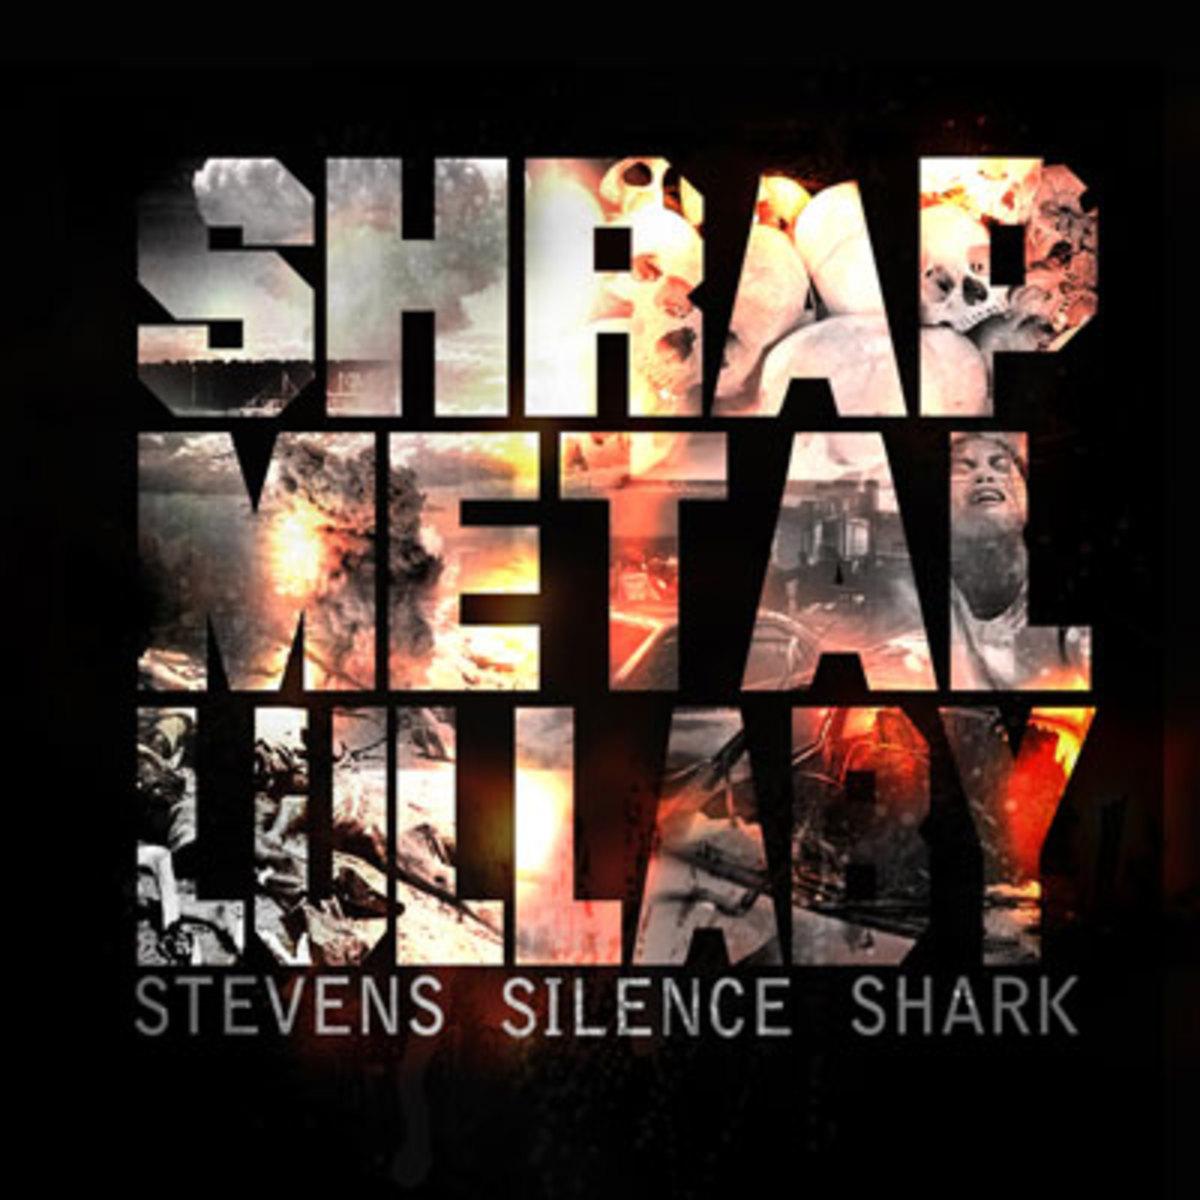 swapmeet-sharpmetal.jpg